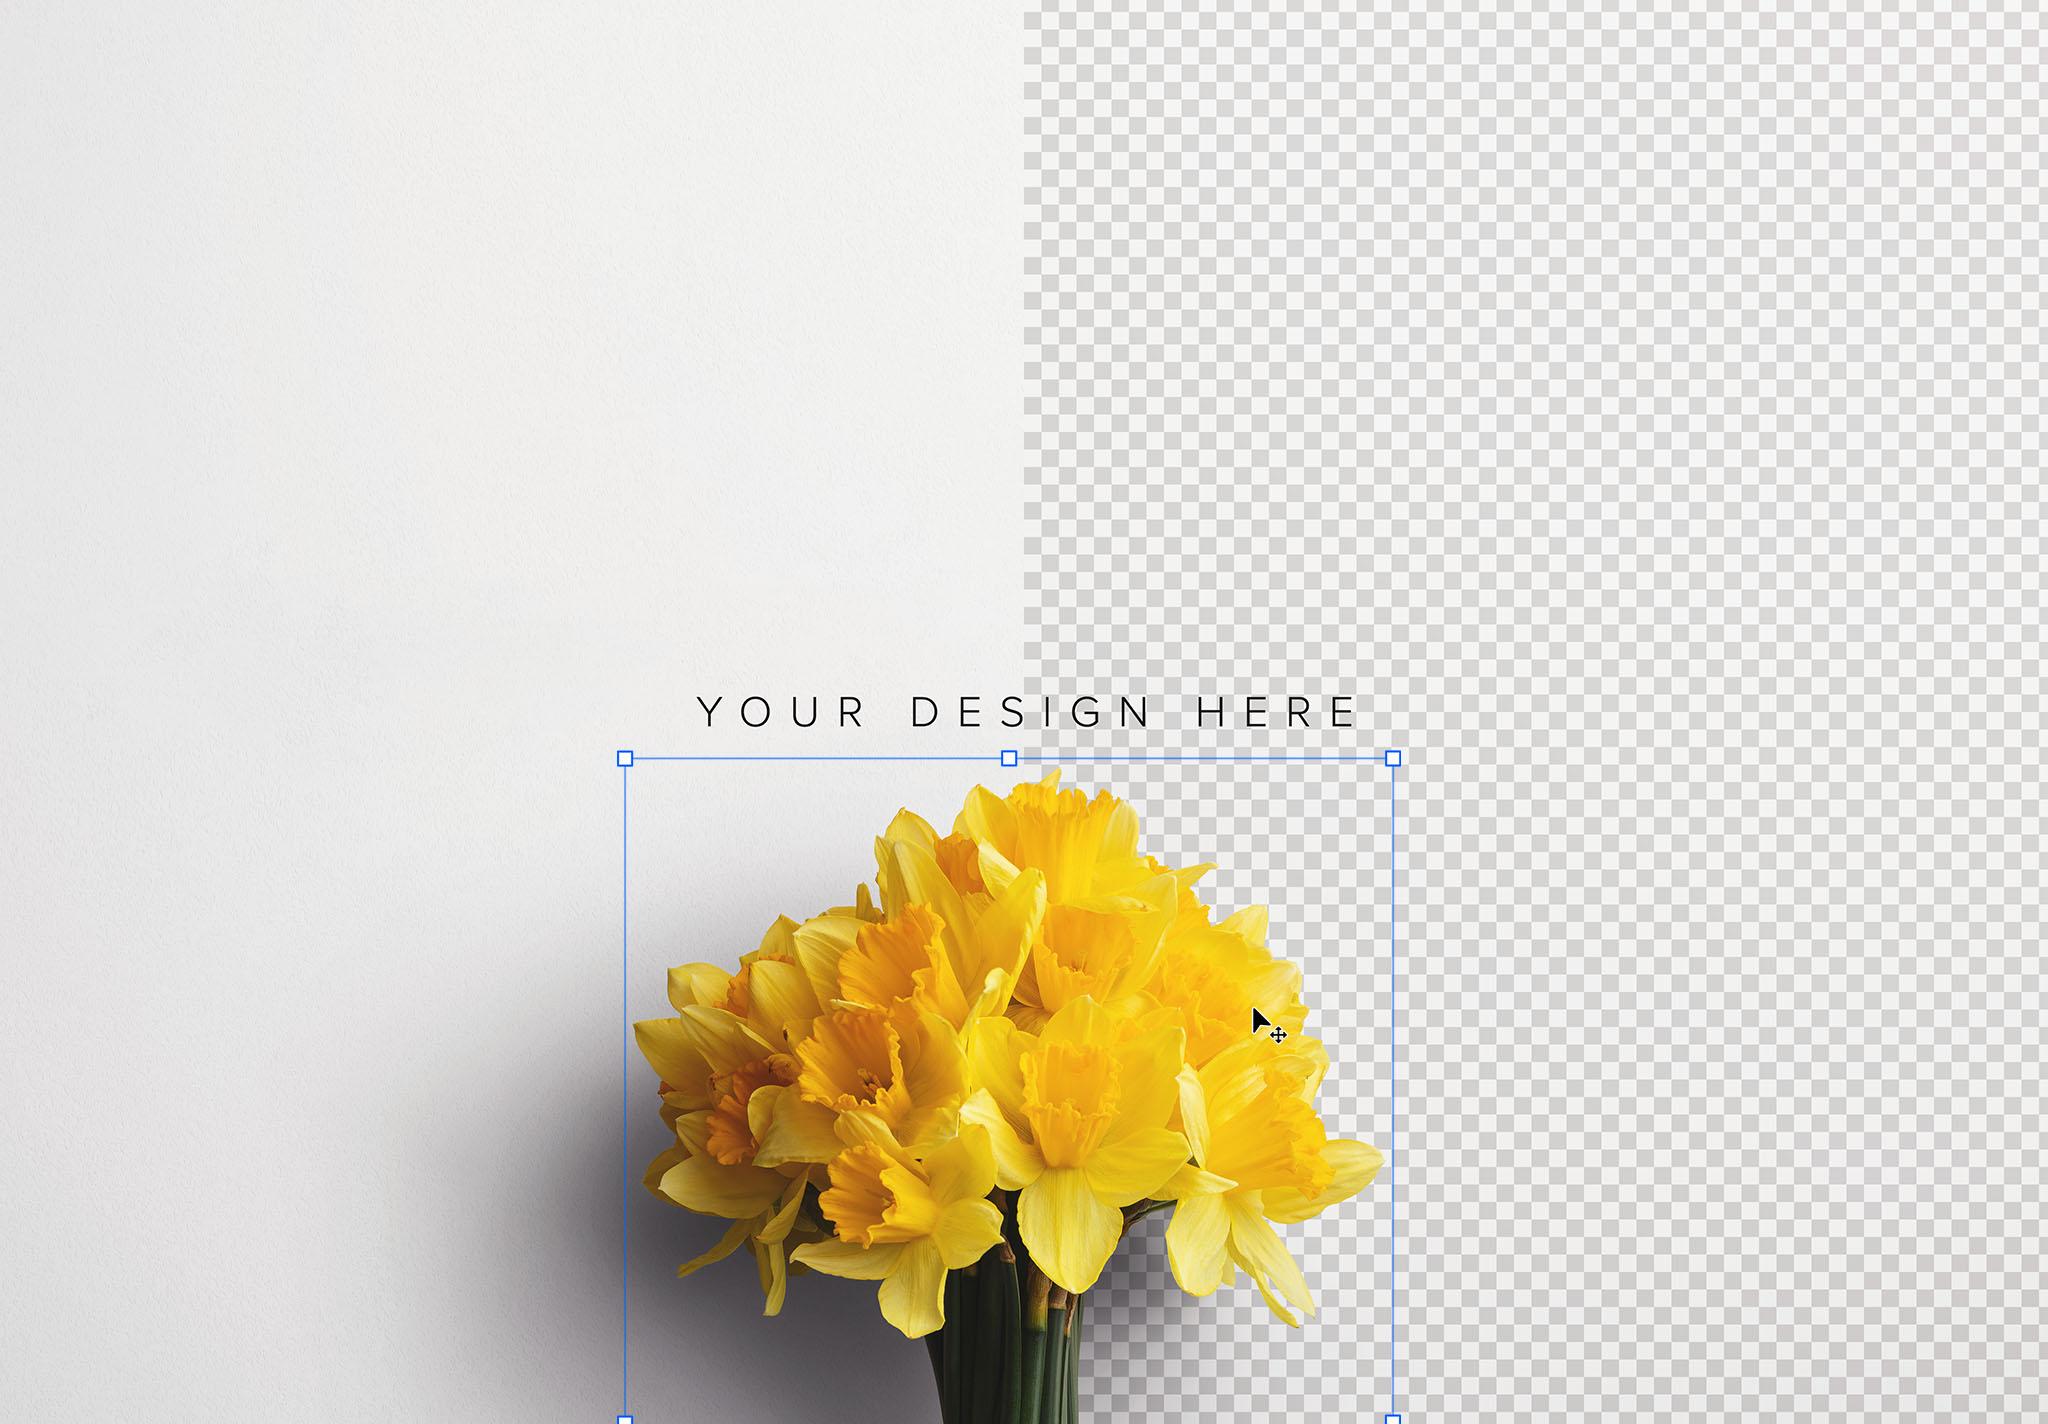 Daffodils Custom Scene Creator Template 3 Image01